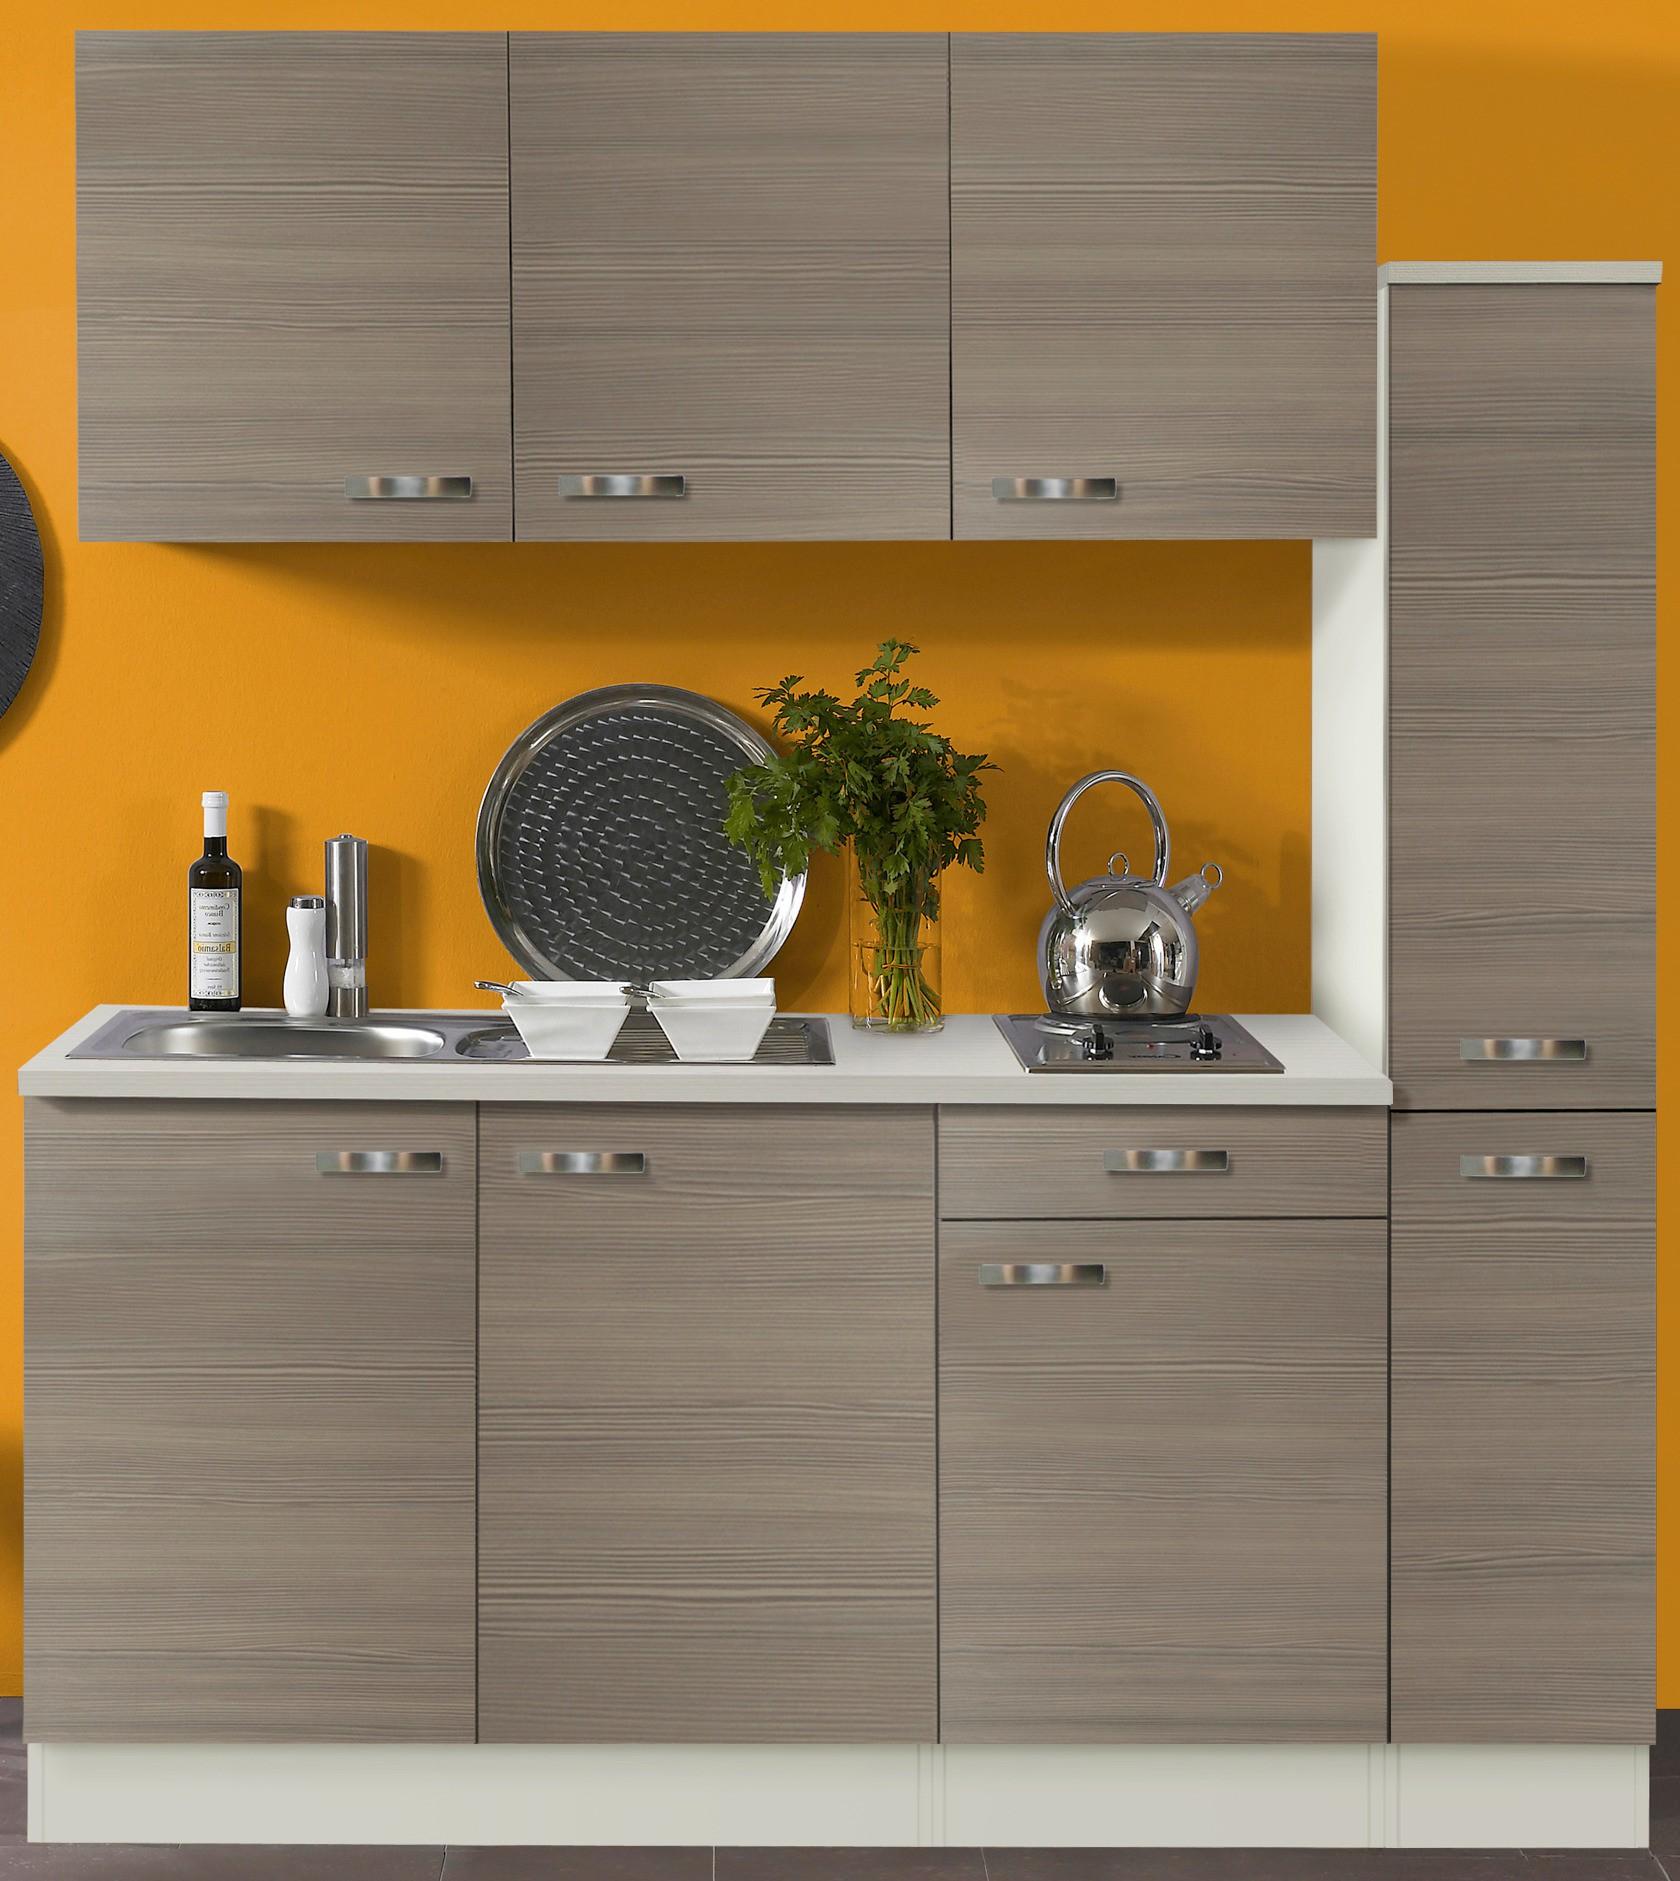 singlek che toledo mit elektro kochfeld 8 teilig breite 180 cm pinie k che singlek chen. Black Bedroom Furniture Sets. Home Design Ideas